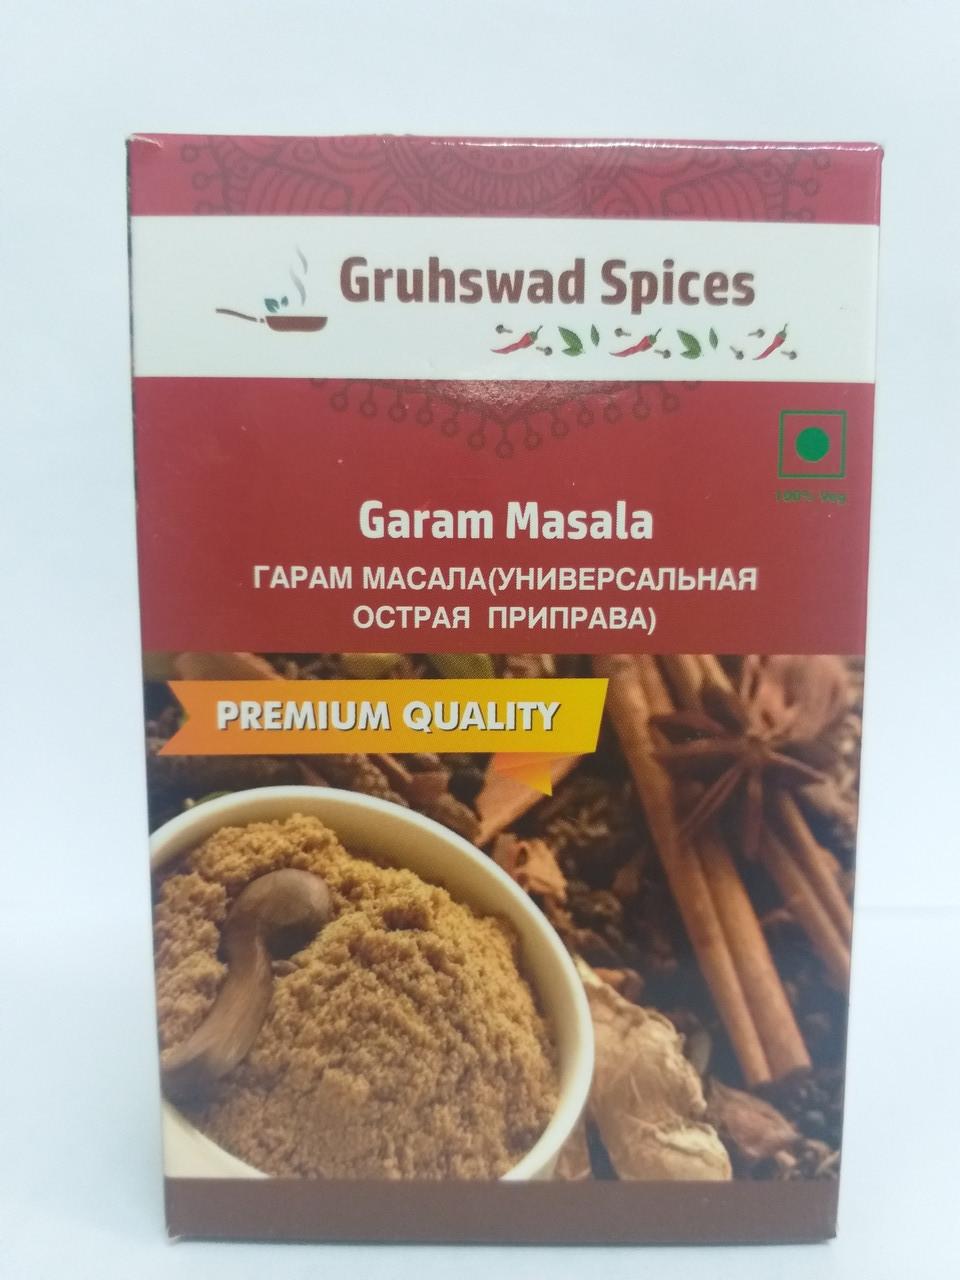 Гарам масала ( универсальная острая приправа) 50 гр, Garam Masala. Gruhswad Spices